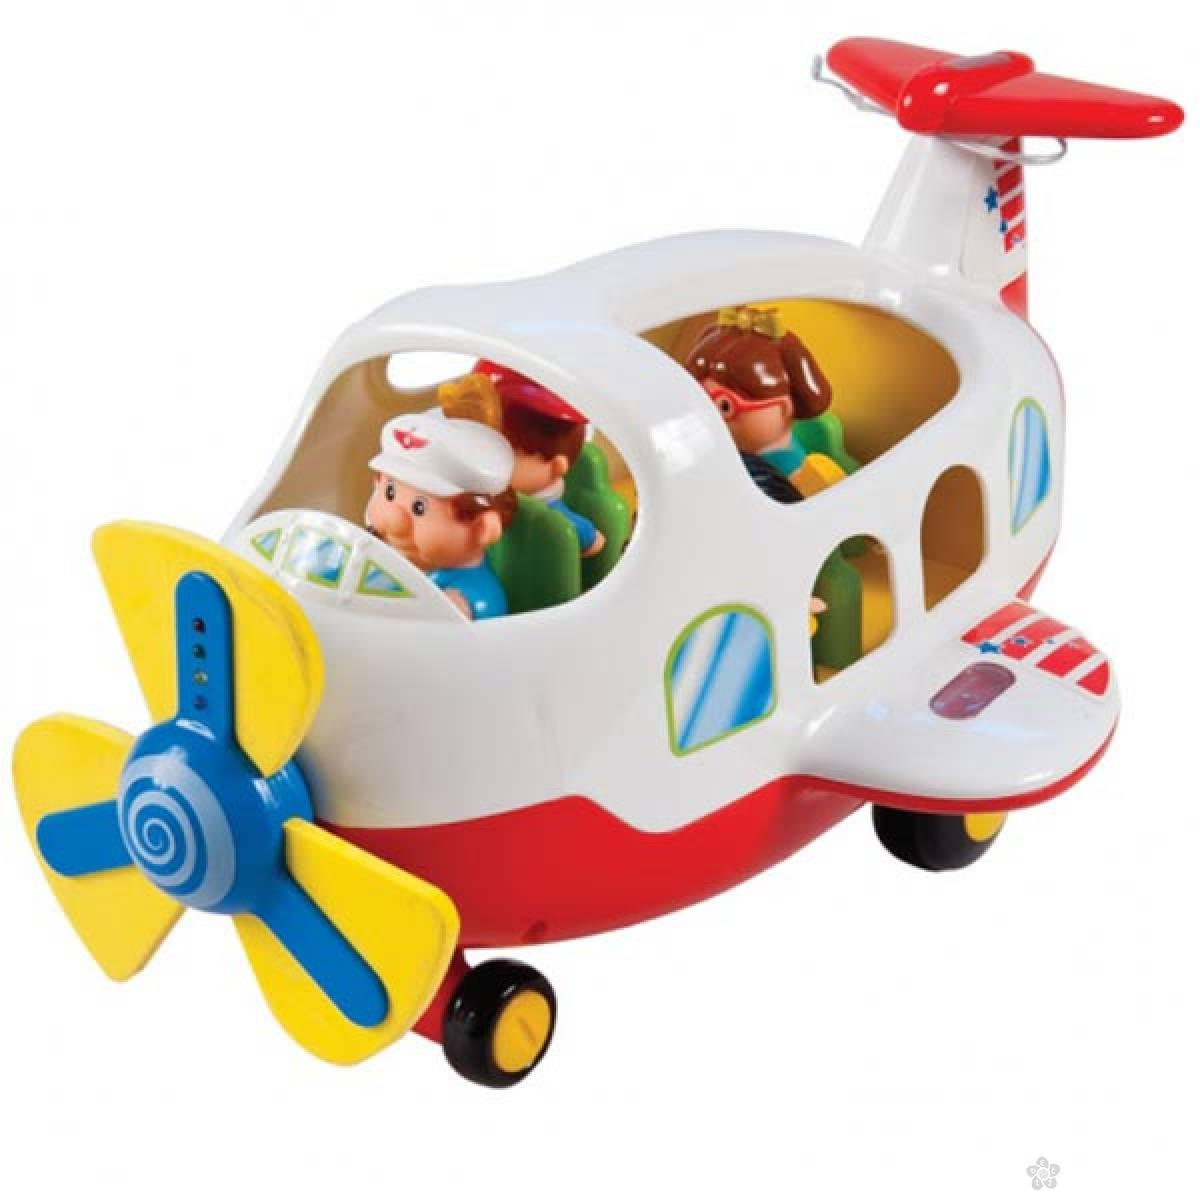 Kiddieland igračka avion 0827